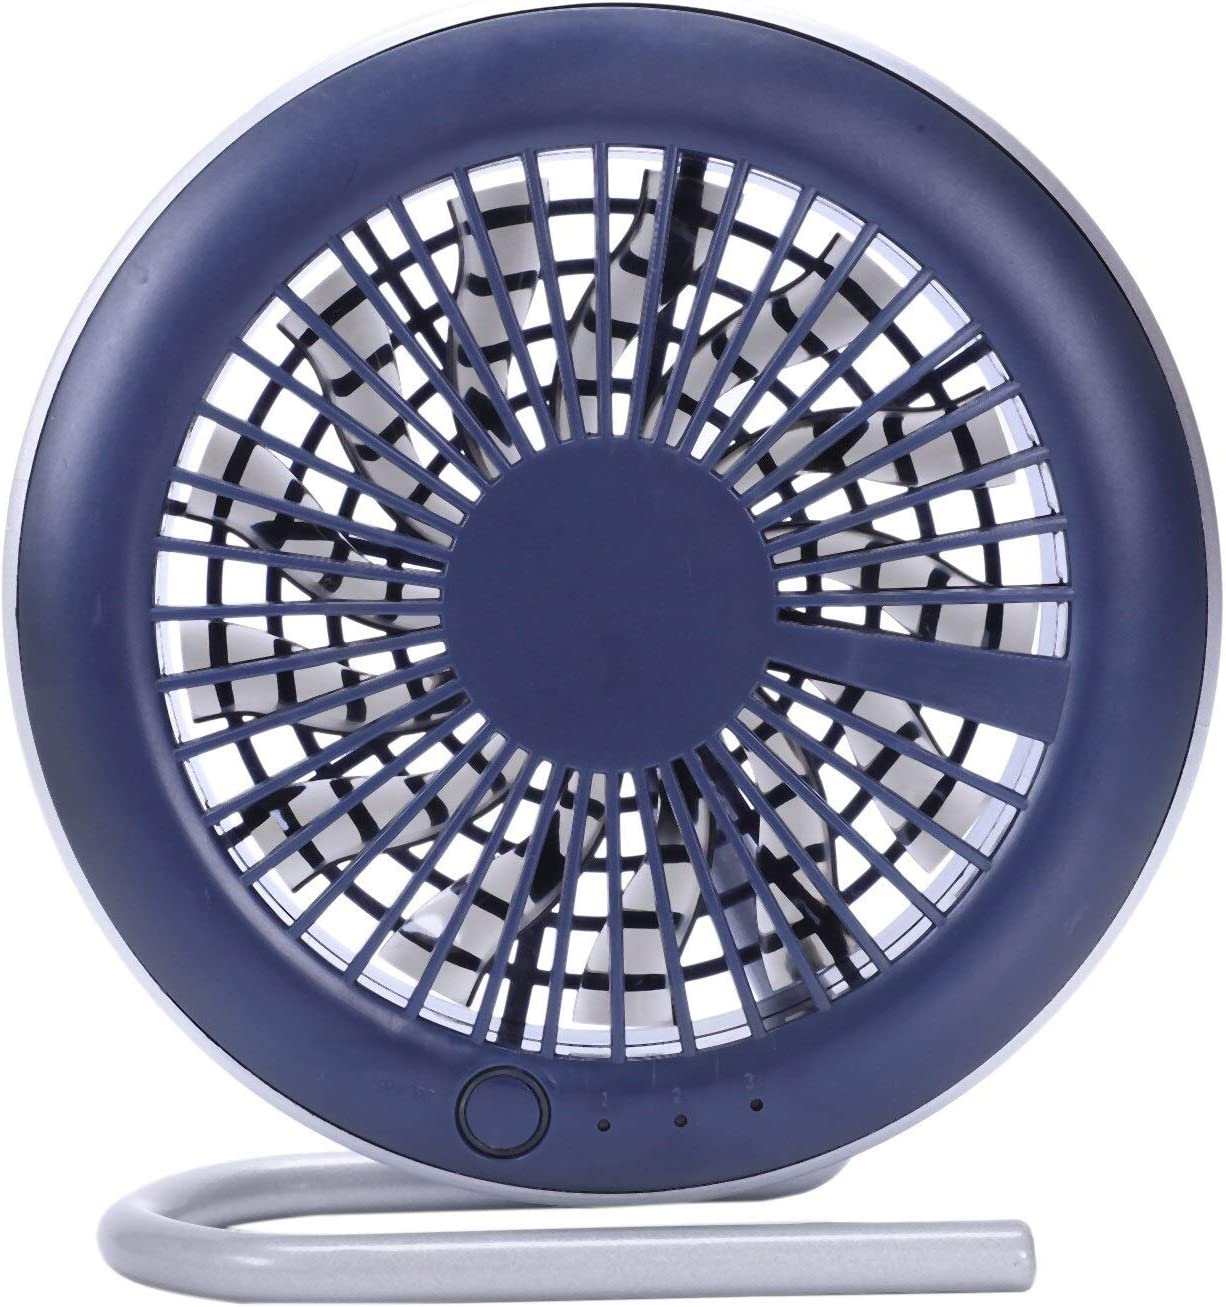 Color : Blue Air Cooling Fan Mini Electric Fan Portable Personal Fan Mute Bed USB Rechargeable Fan Holder Bracket for Car